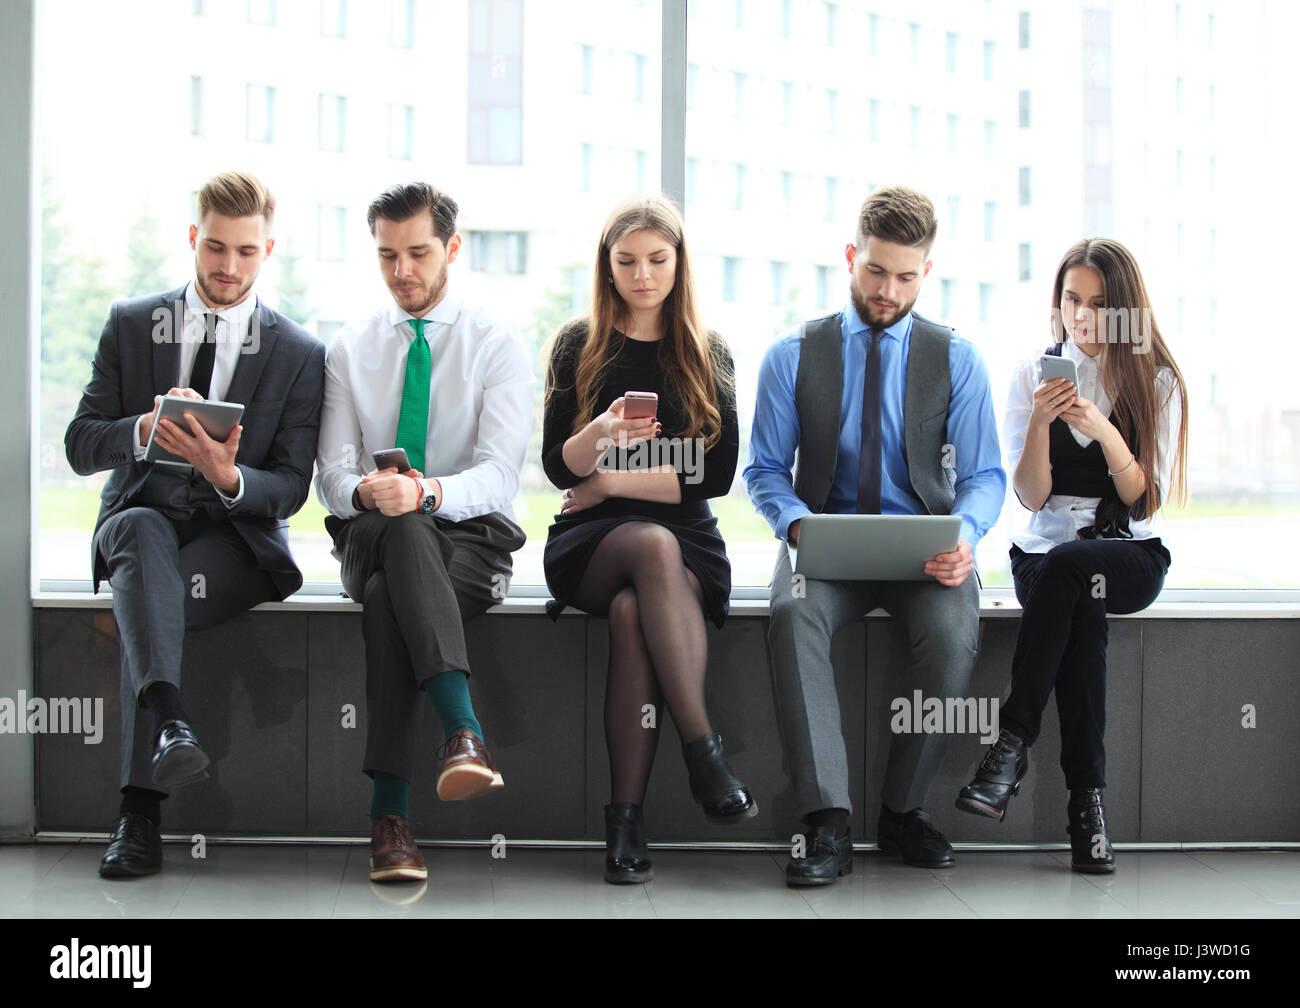 Business Team Office Worker Entrepreneur Concept - Stock Image